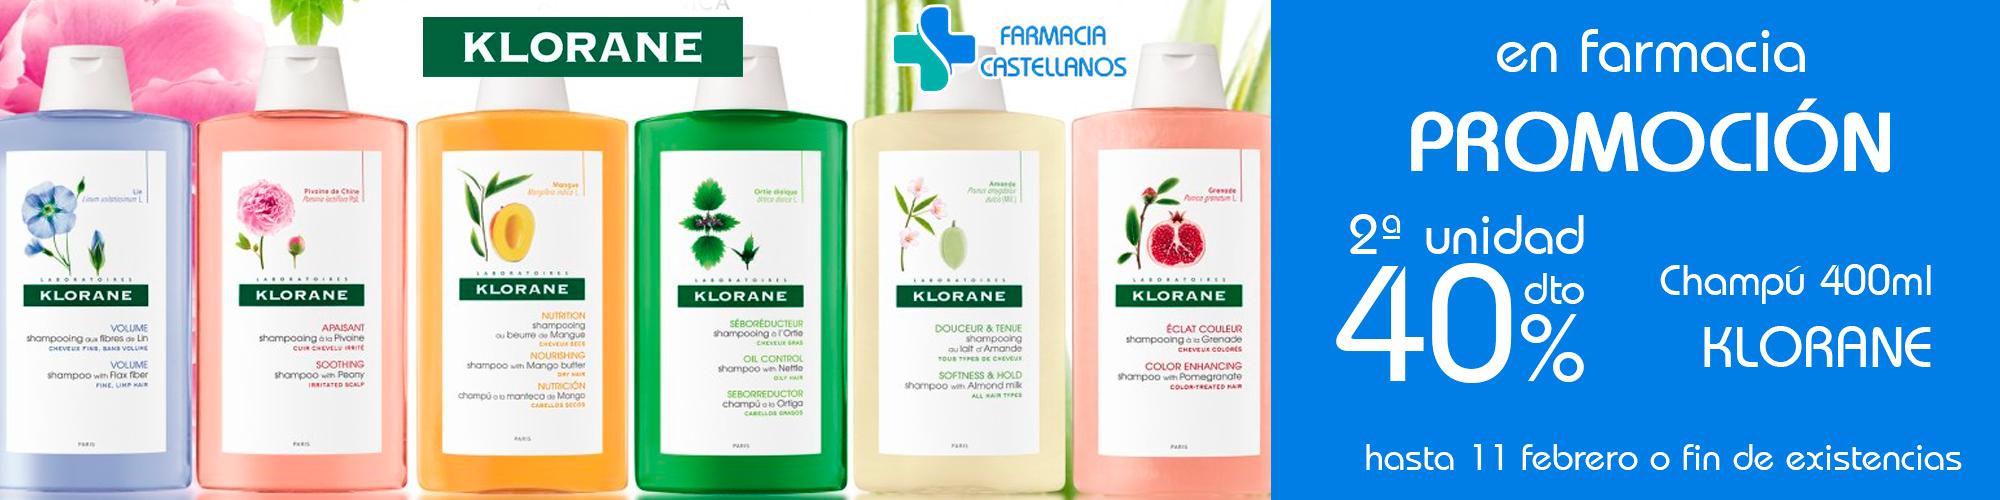 promocion-klorane-farmaciabeatrizcastellanos